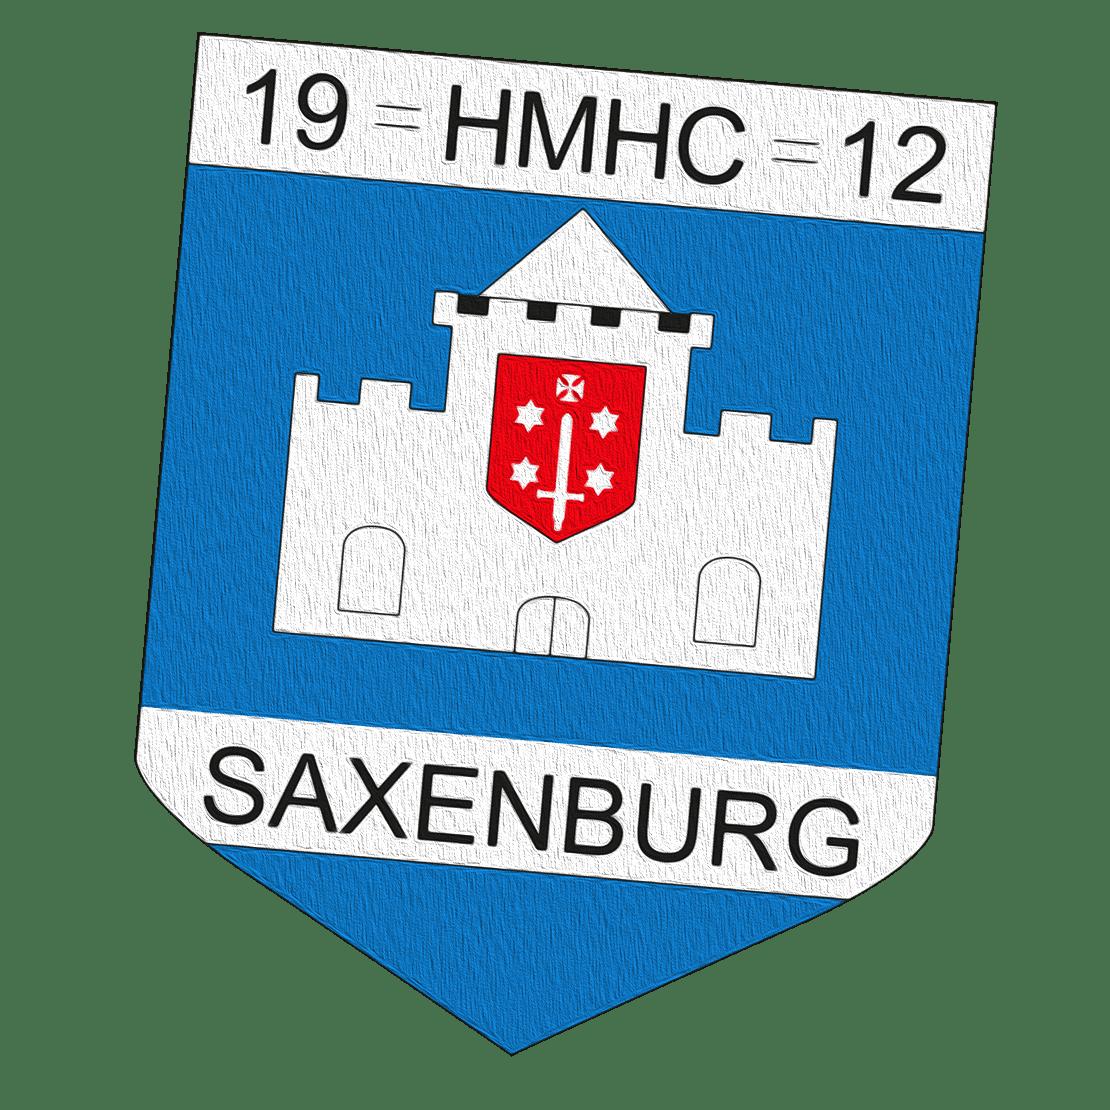 Saxenburg logo